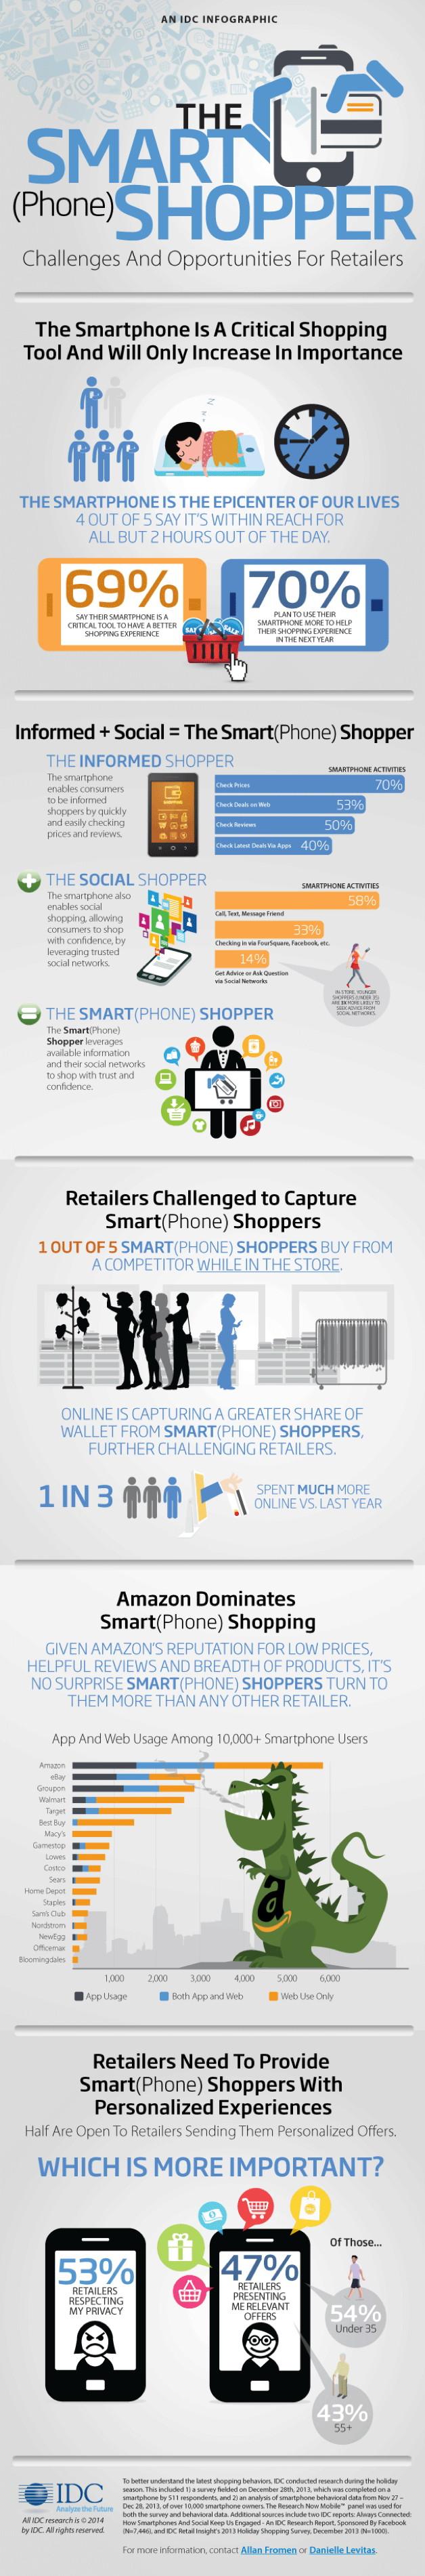 smartshopper_infographic